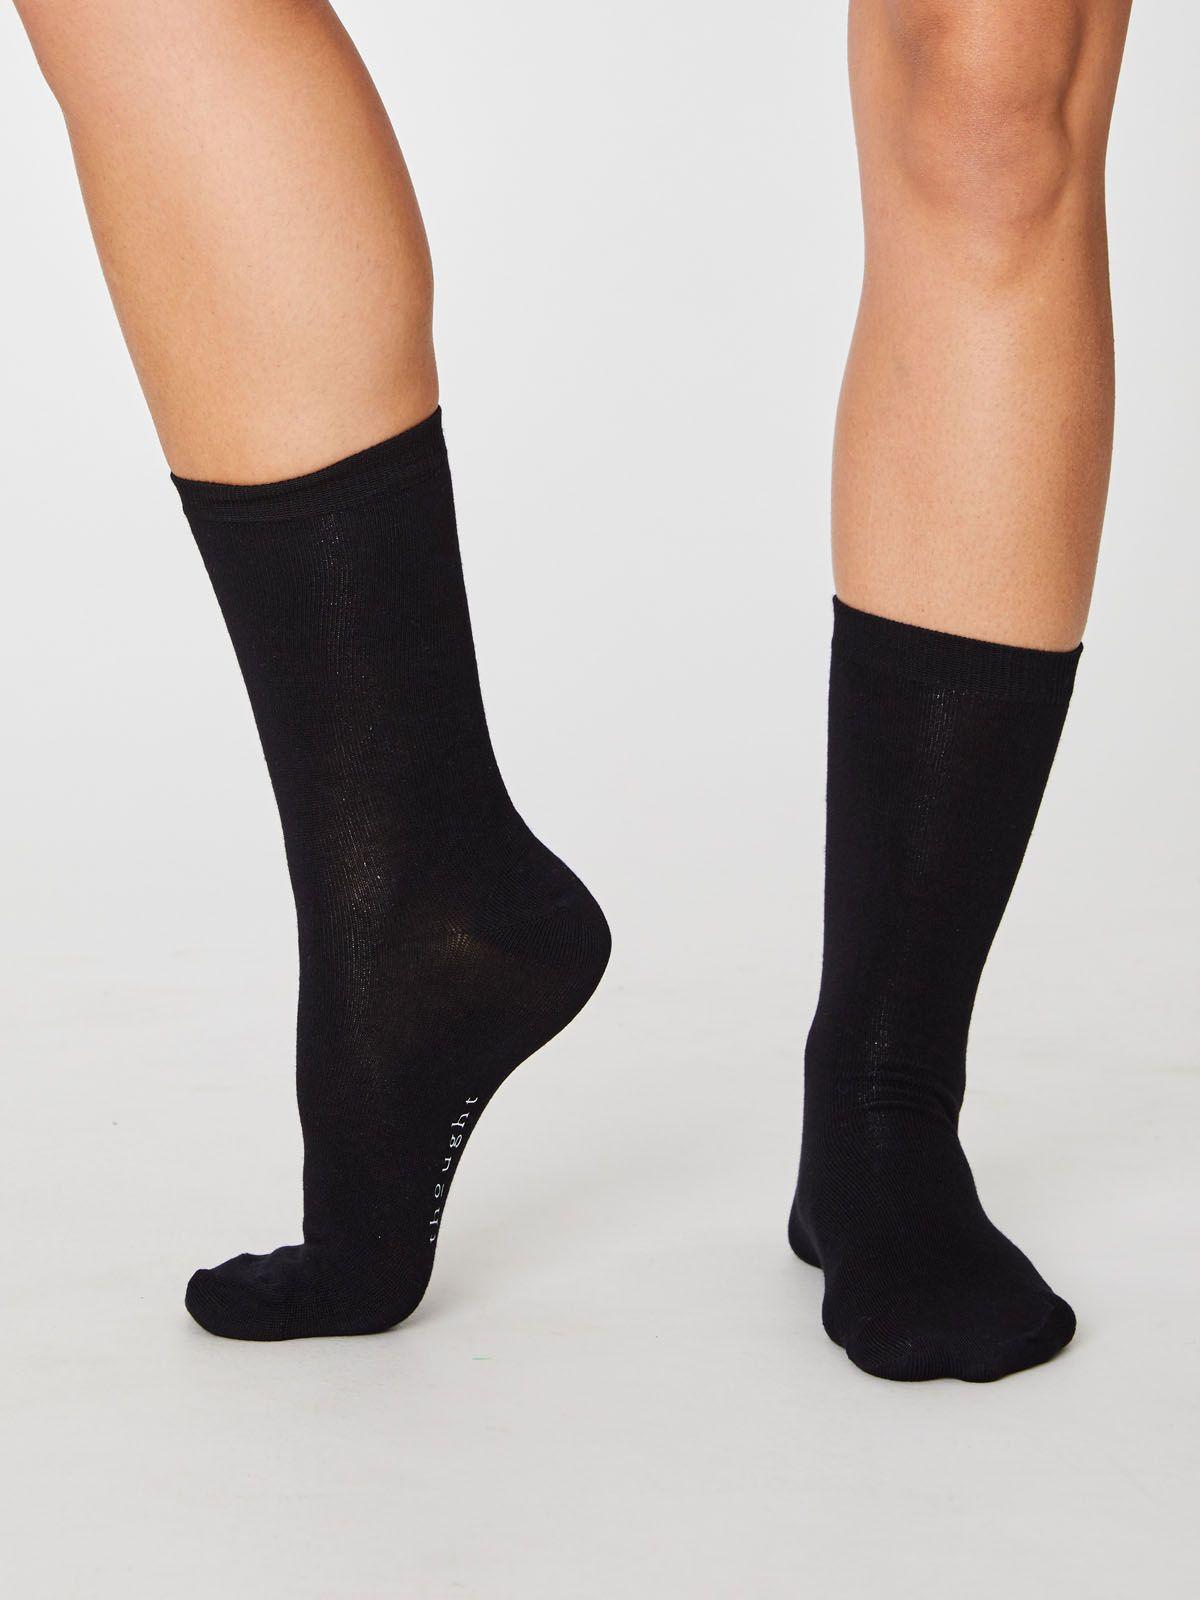 spw249-black_spw249-black–solid-jackie-womens-bamboo-socks-0002.jpg